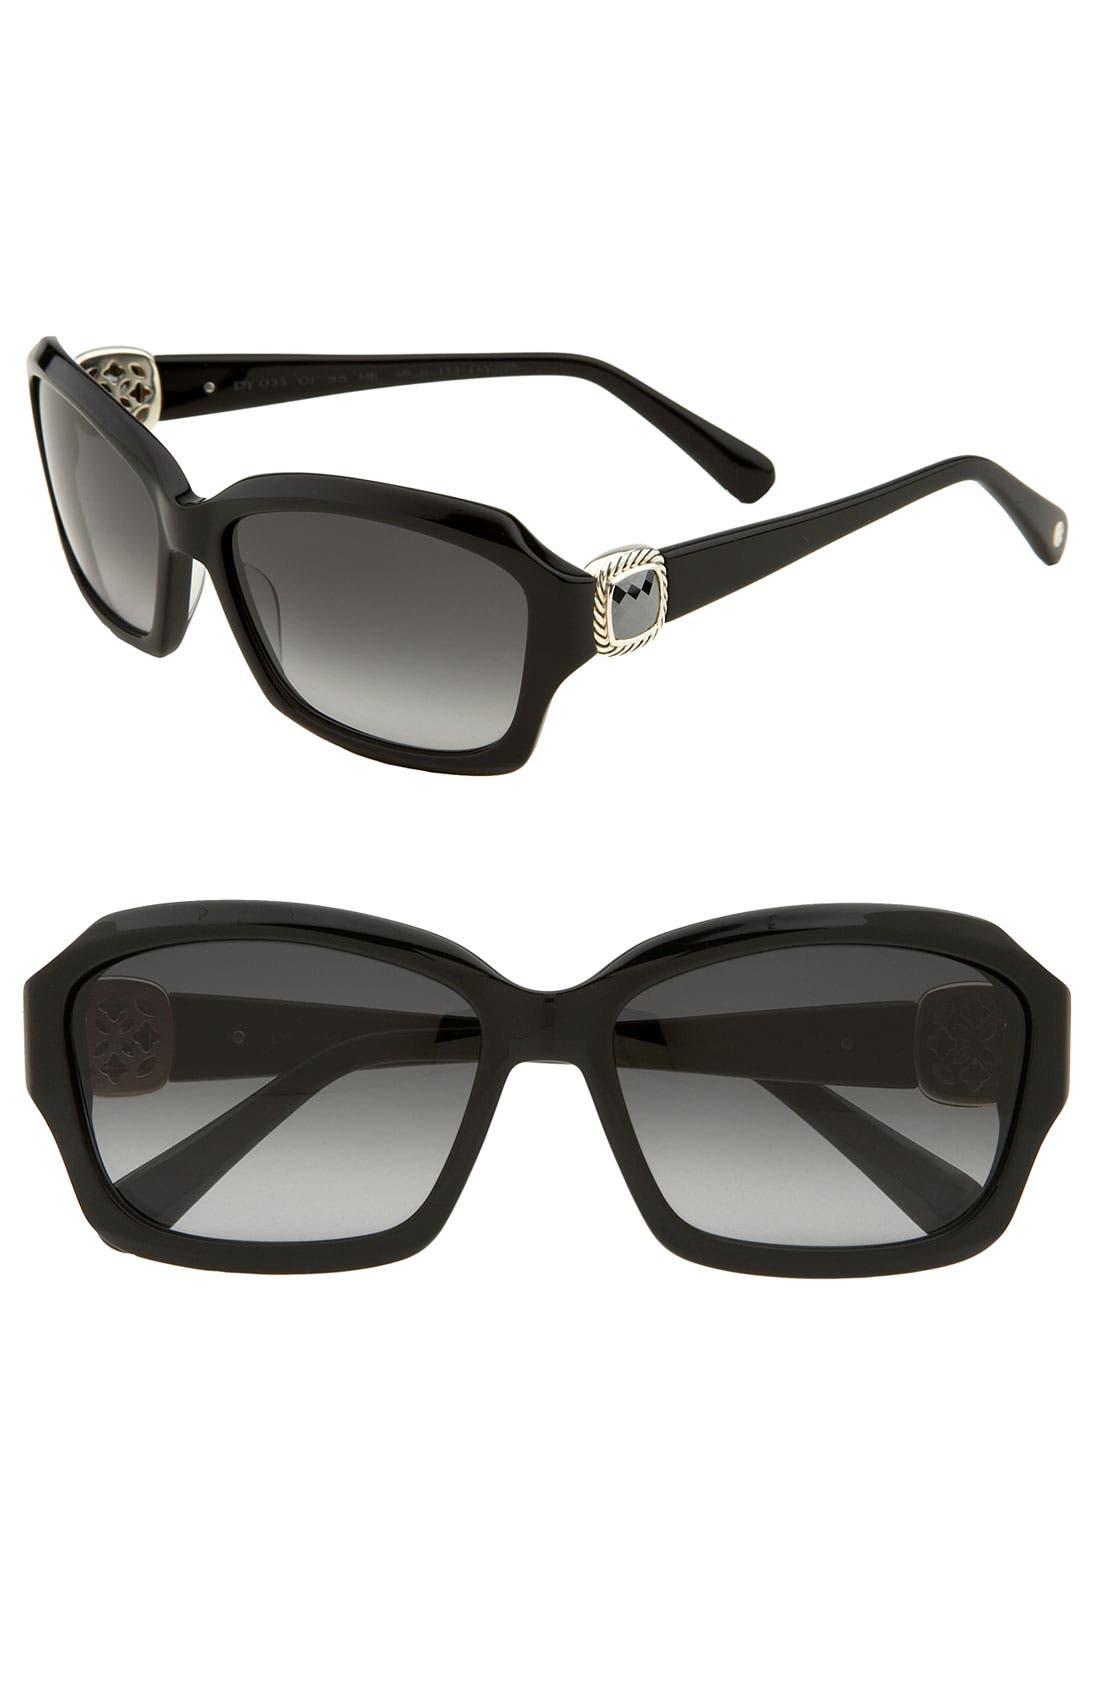 DAVID YURMAN 'Albion' Geometric Sunglasses, Main, color, 001